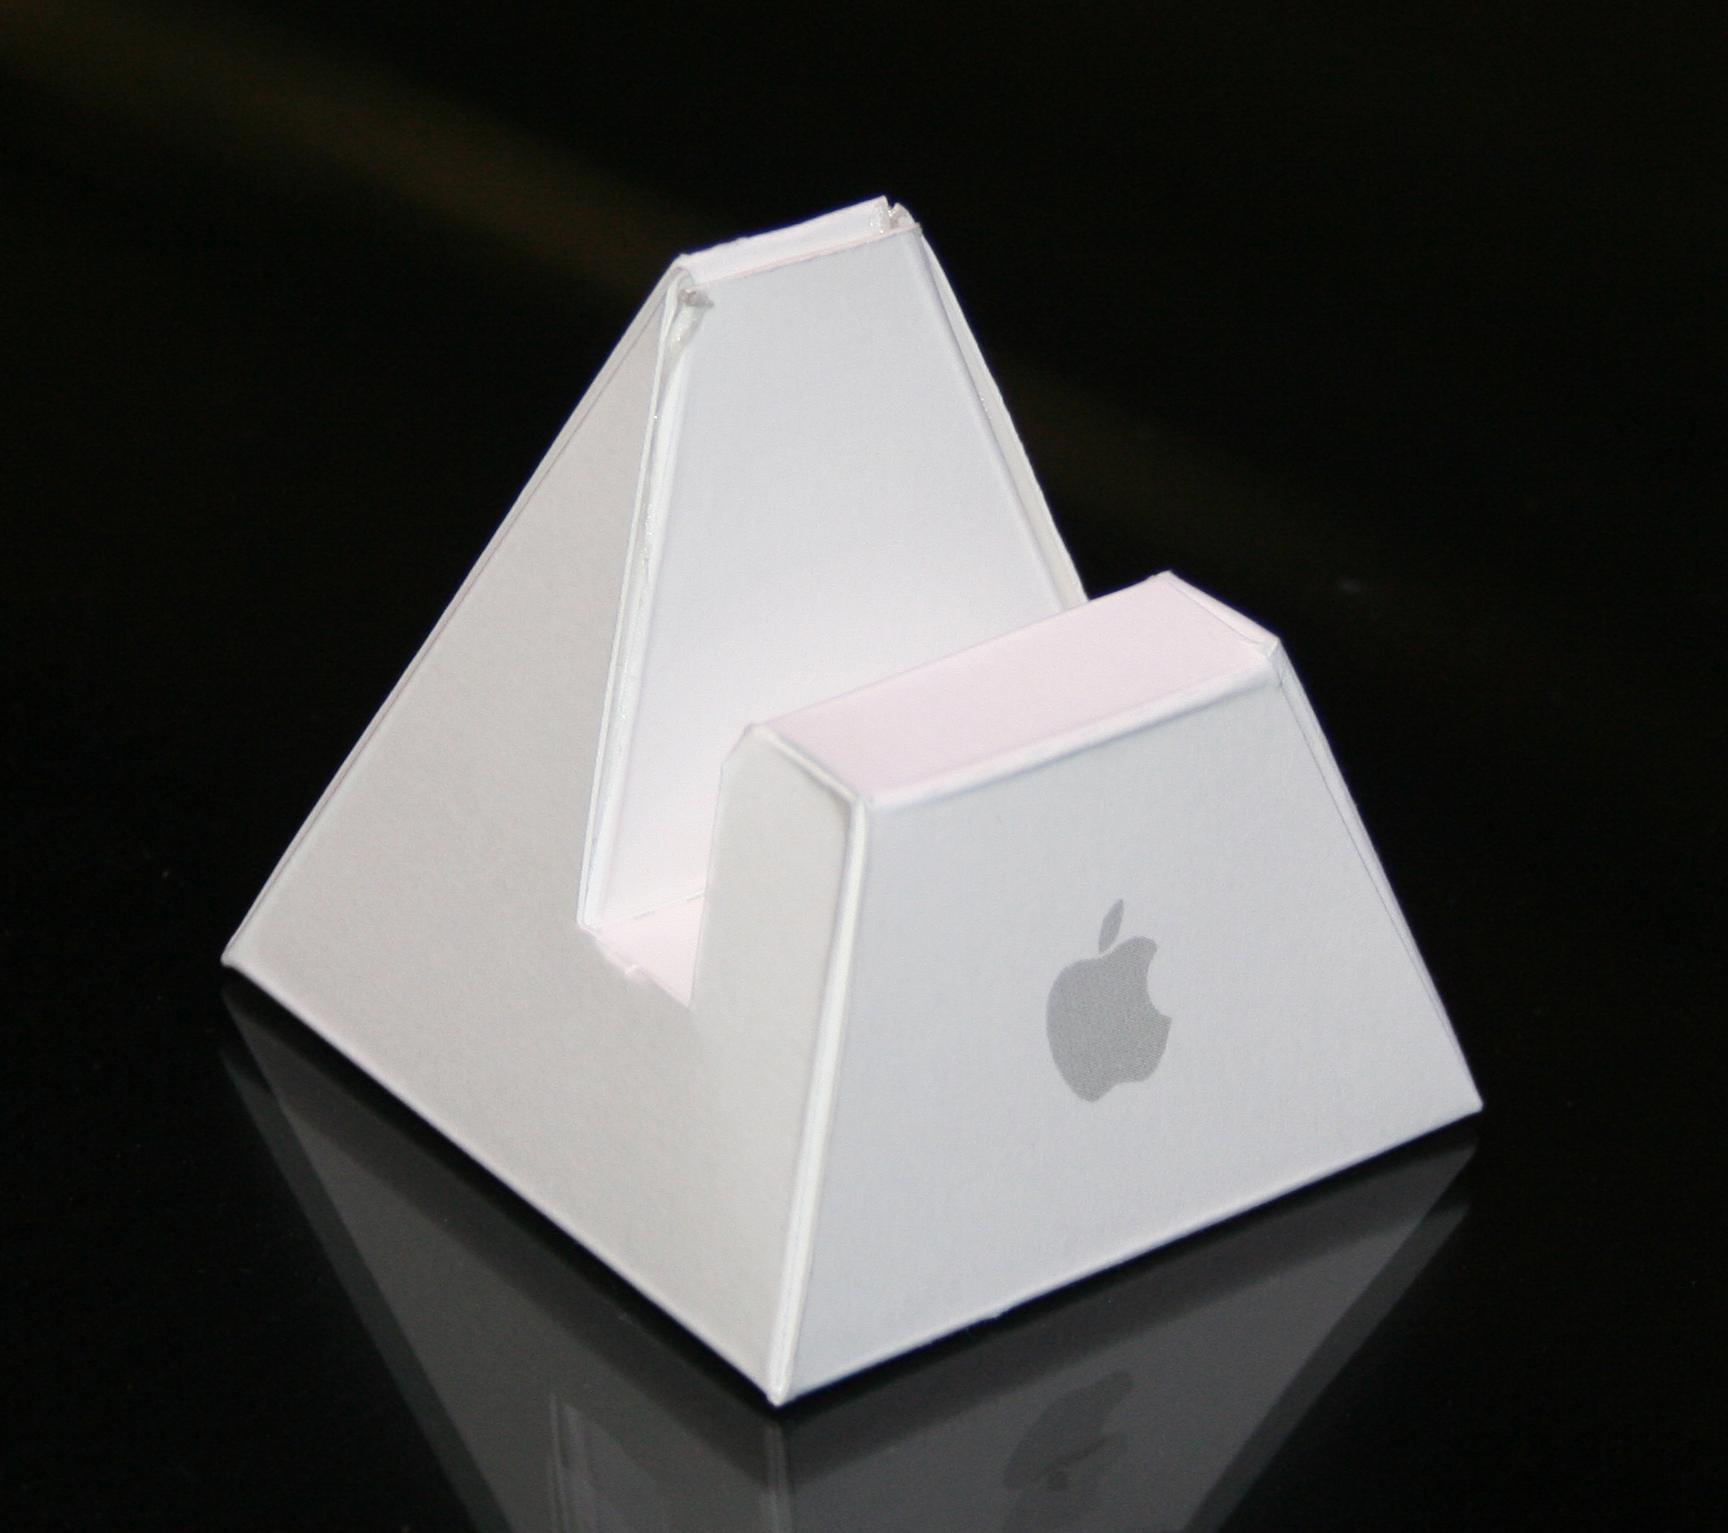 PAPER IPHONE DOCK STAND EBOOK